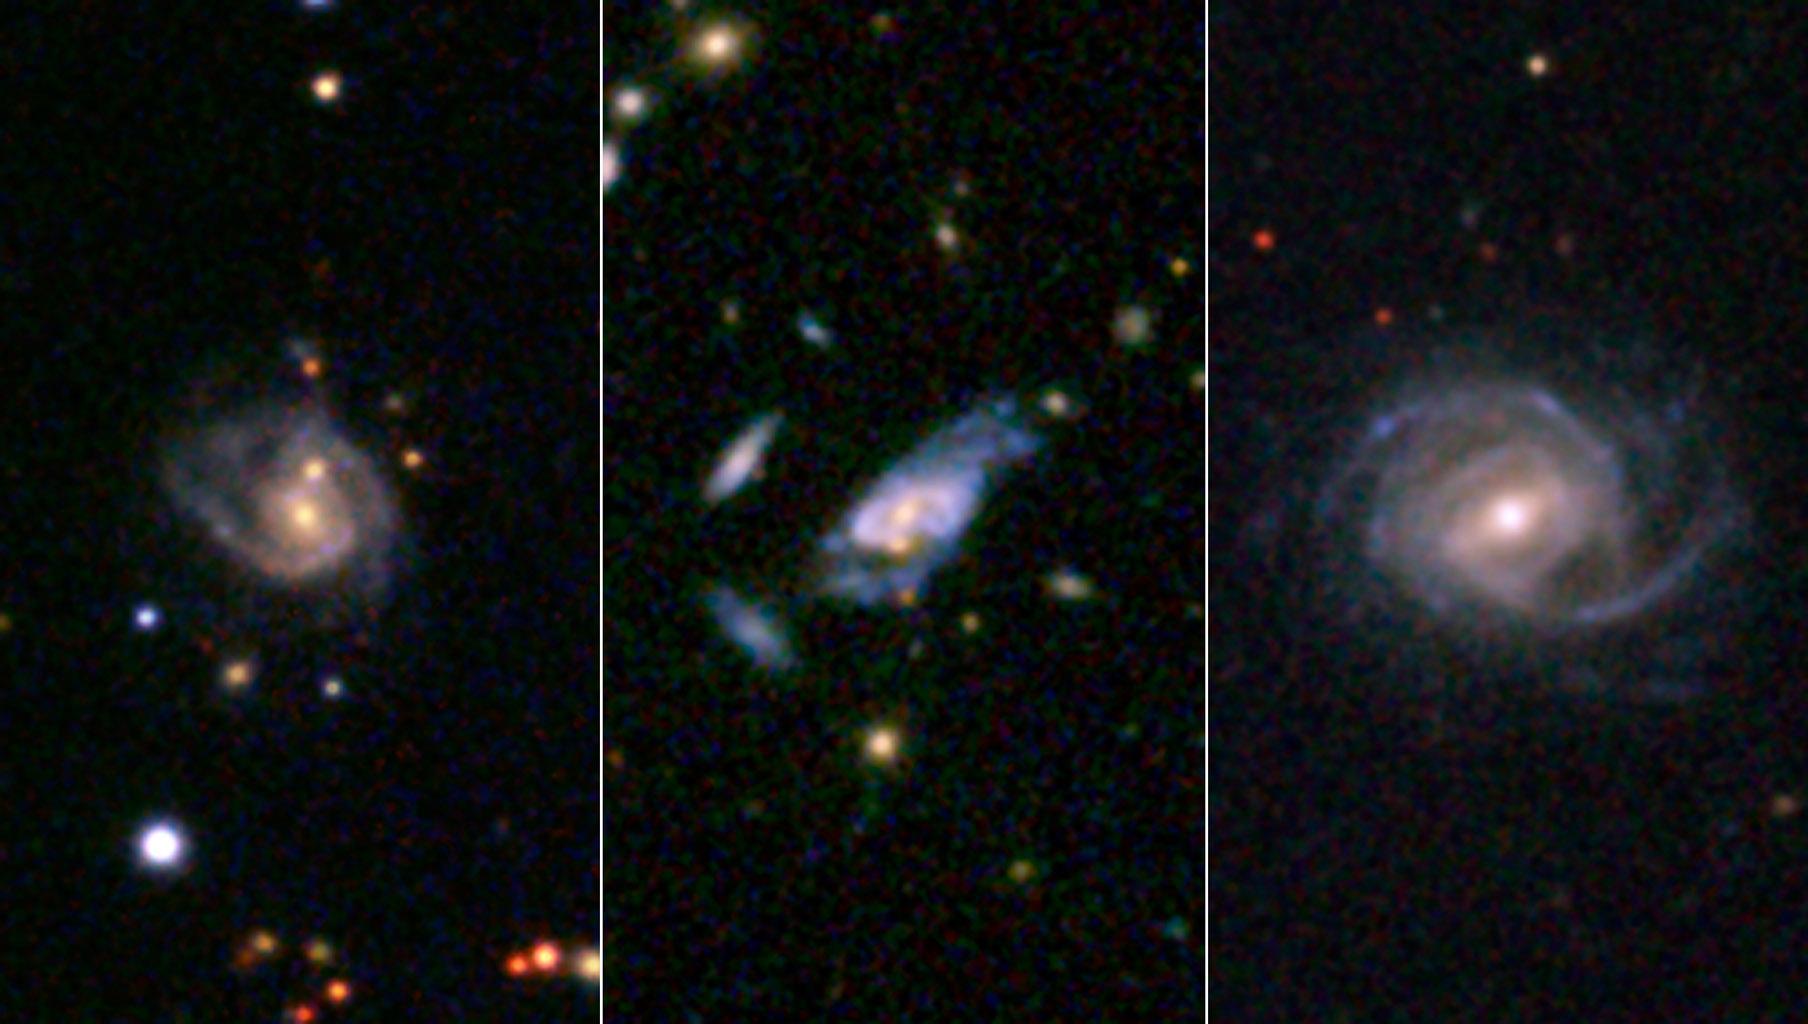 Space Images Gargantuan Super Spiral Galaxies Loom